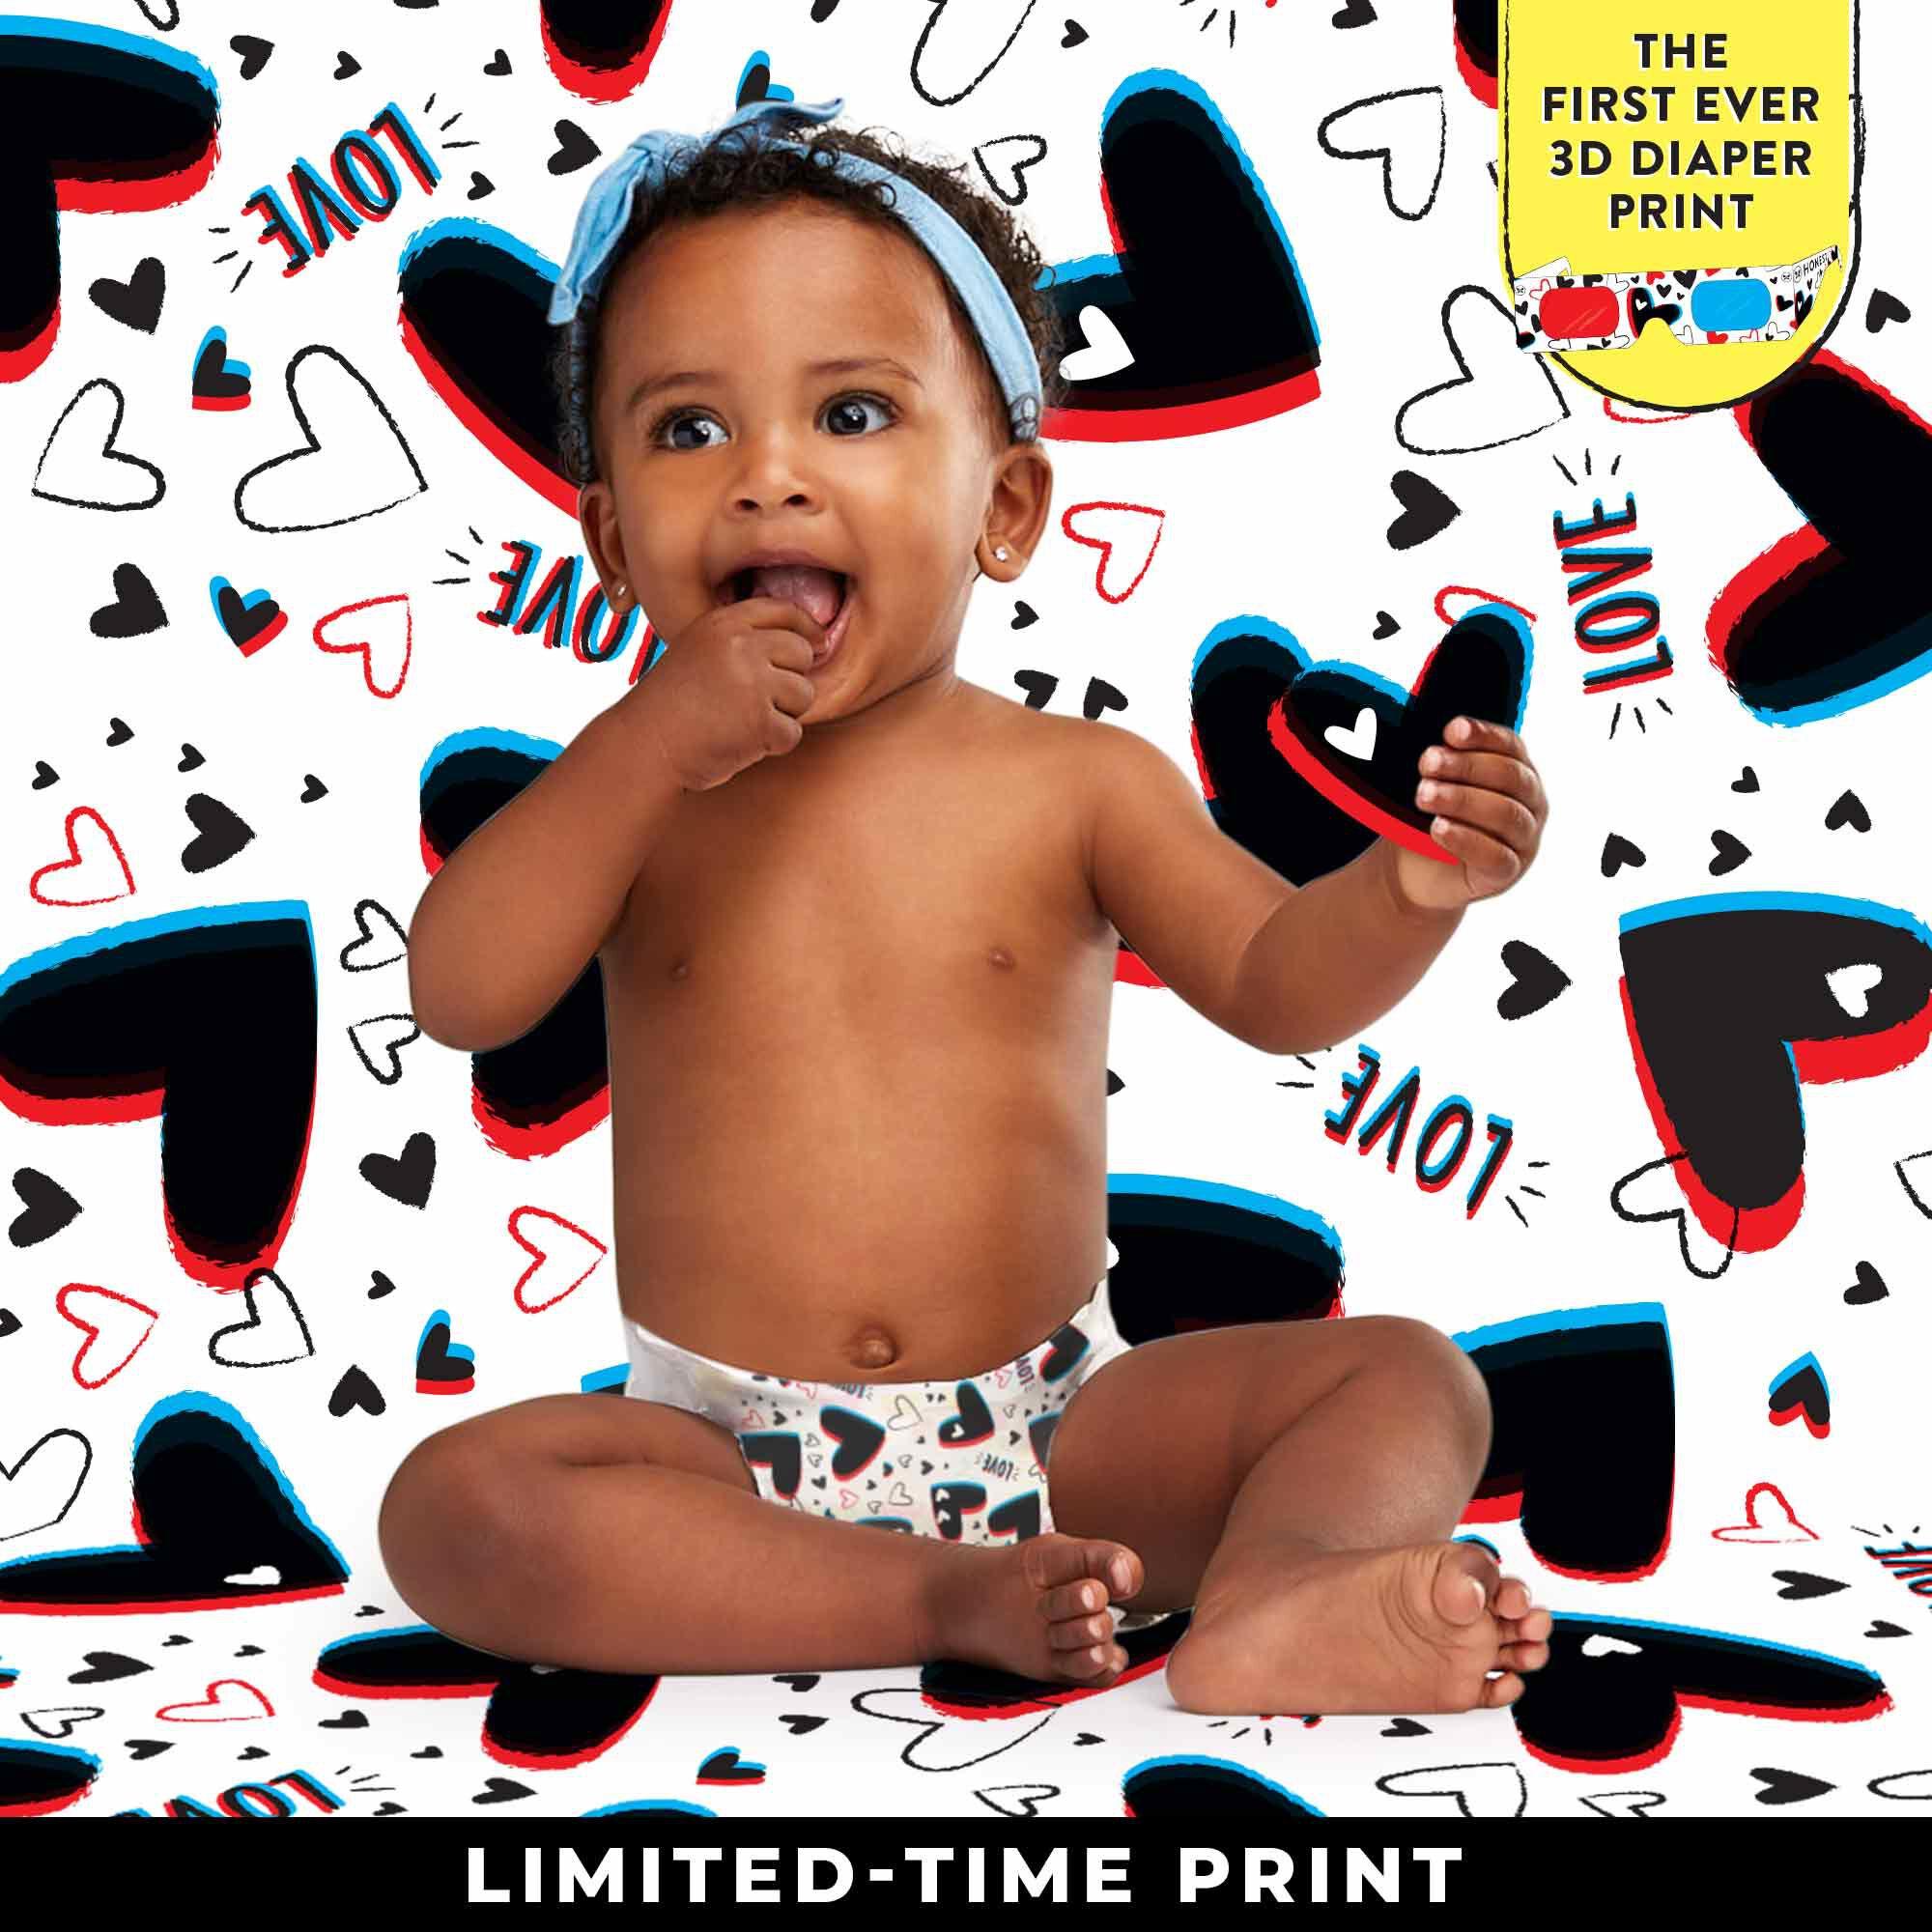 valentines diaper - limited edition diaper